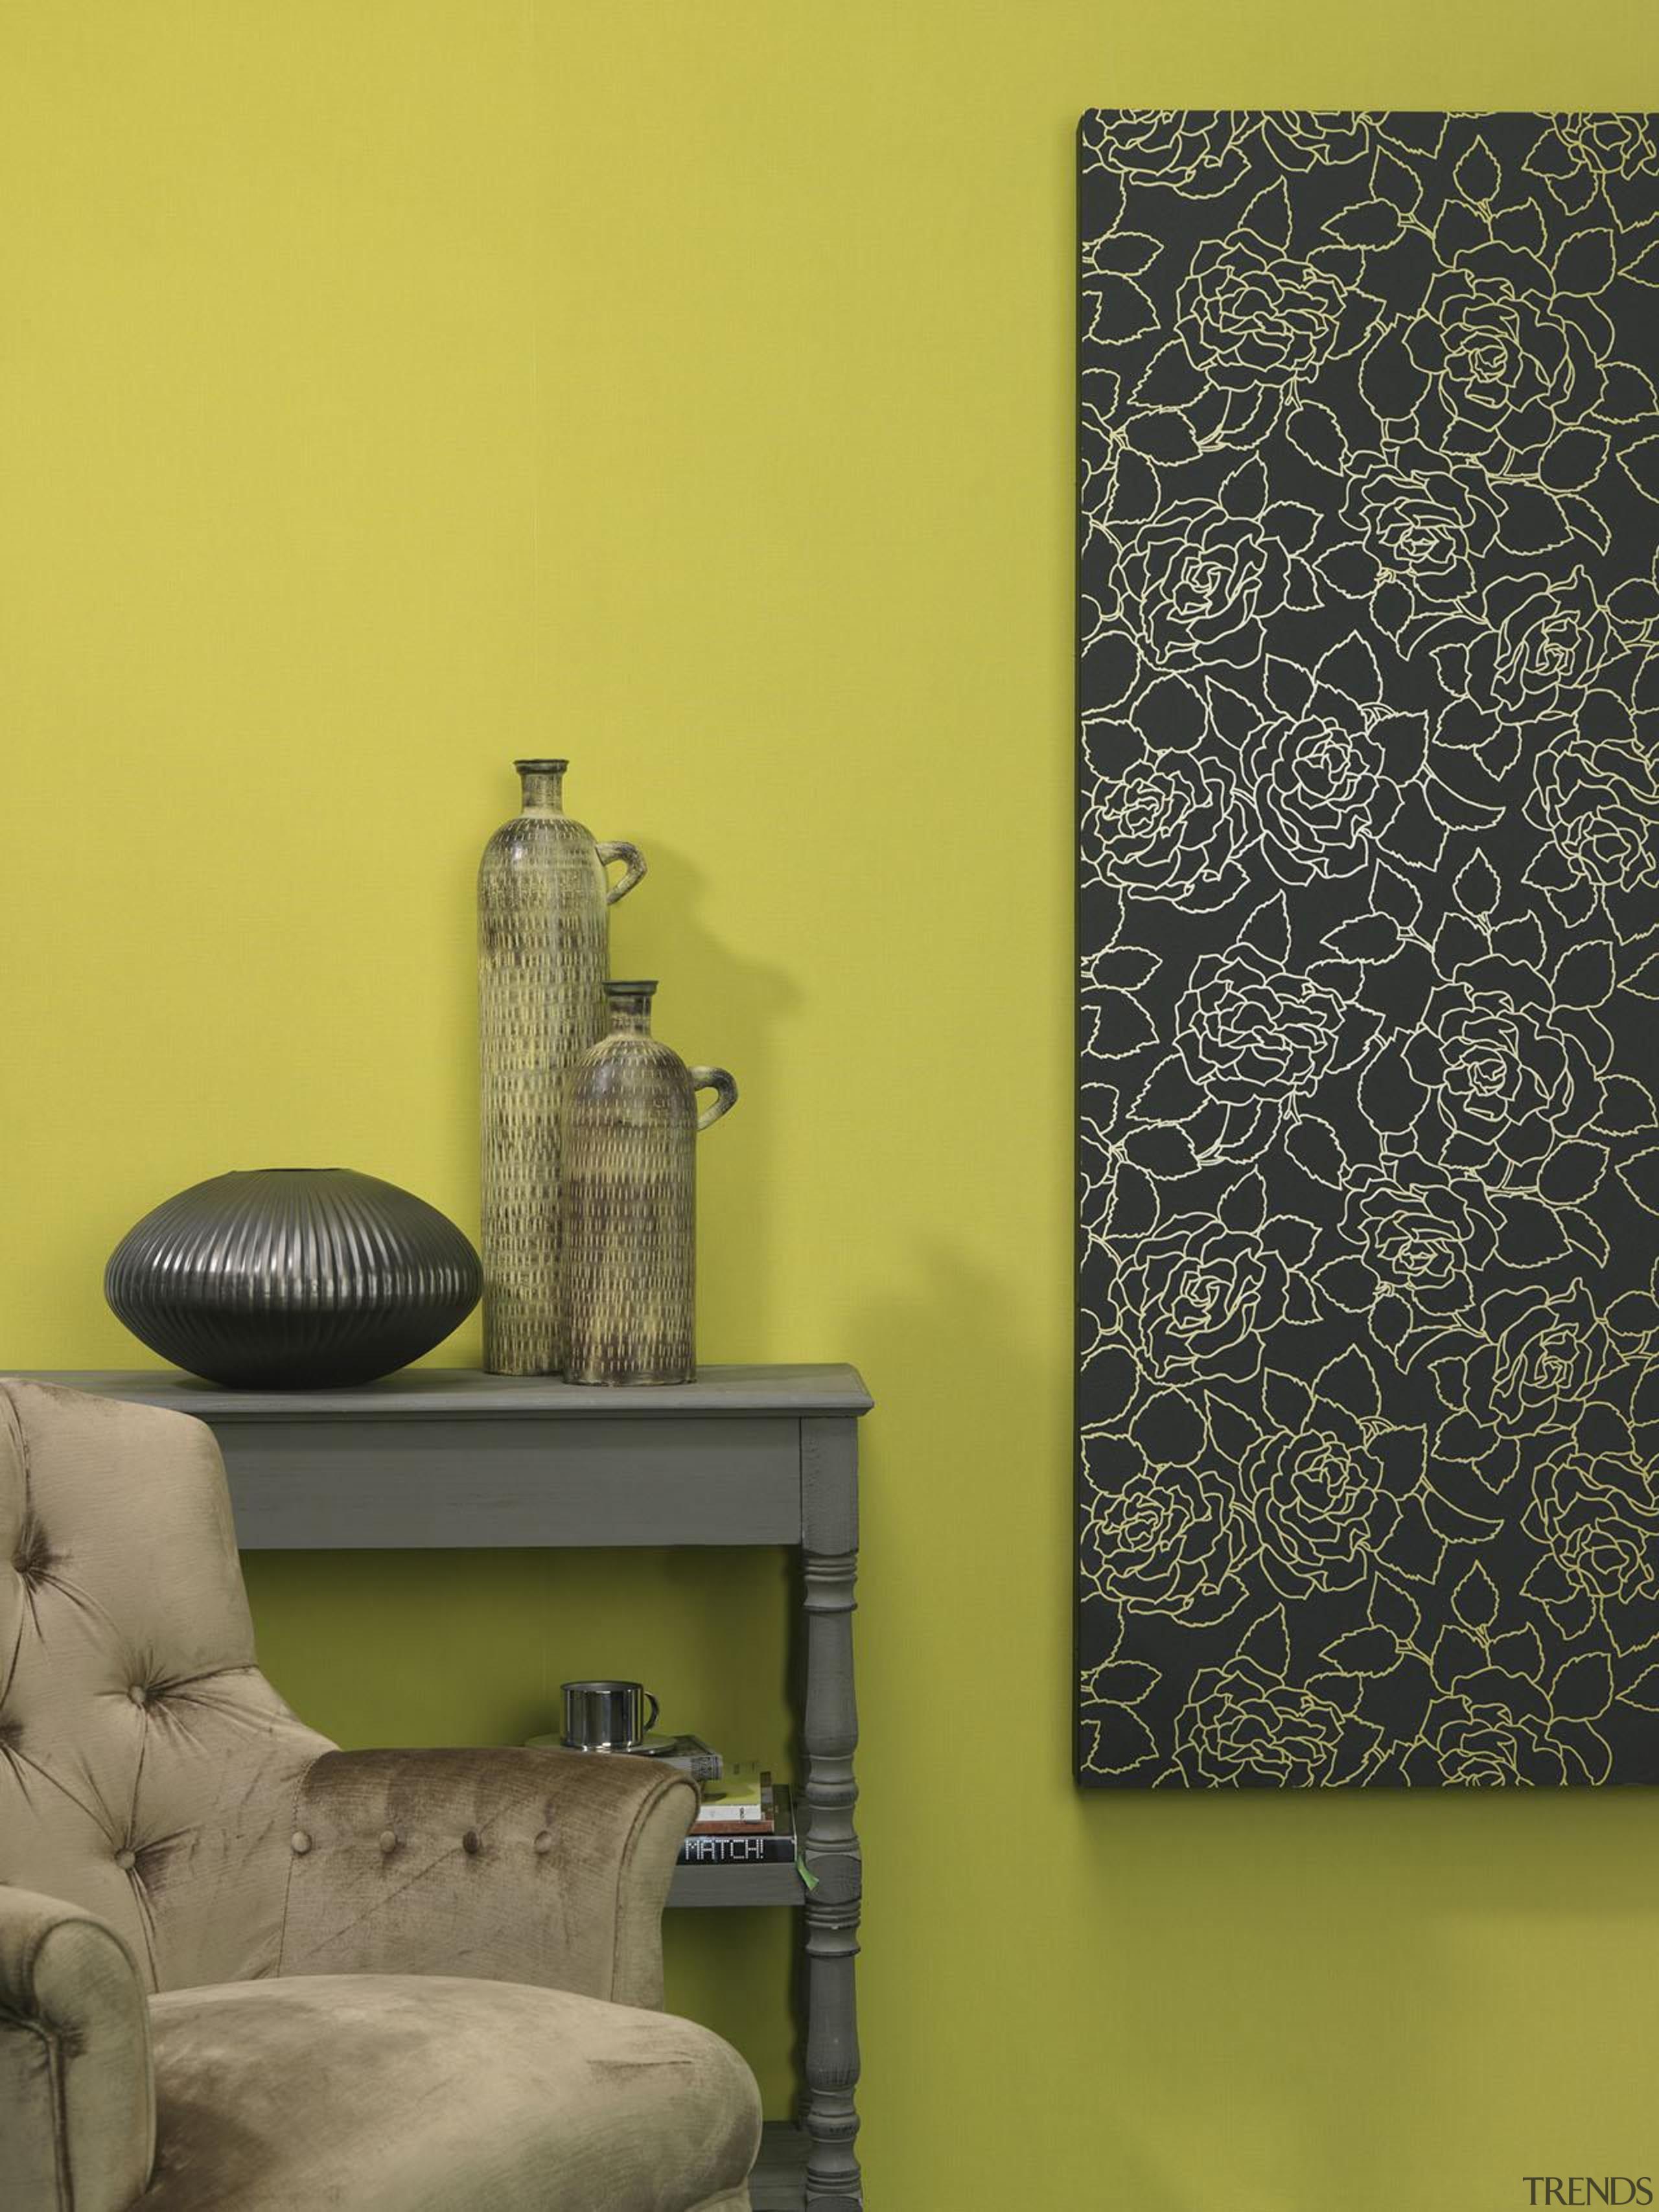 Brocante II Range - Brocante II Range - interior design, living room, wall, wallpaper, yellow, brown